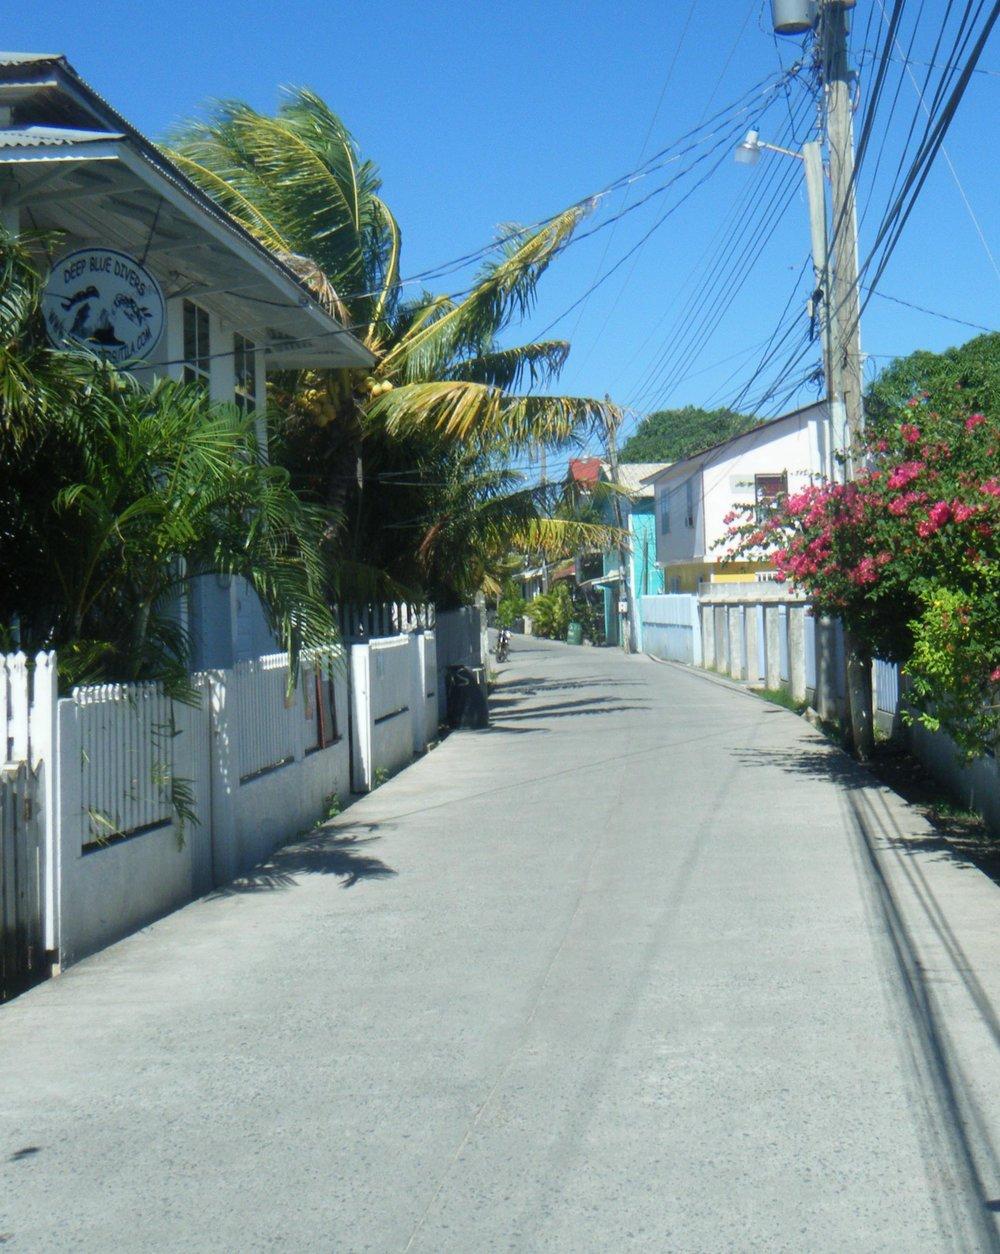 mean streets of Utila.jpg